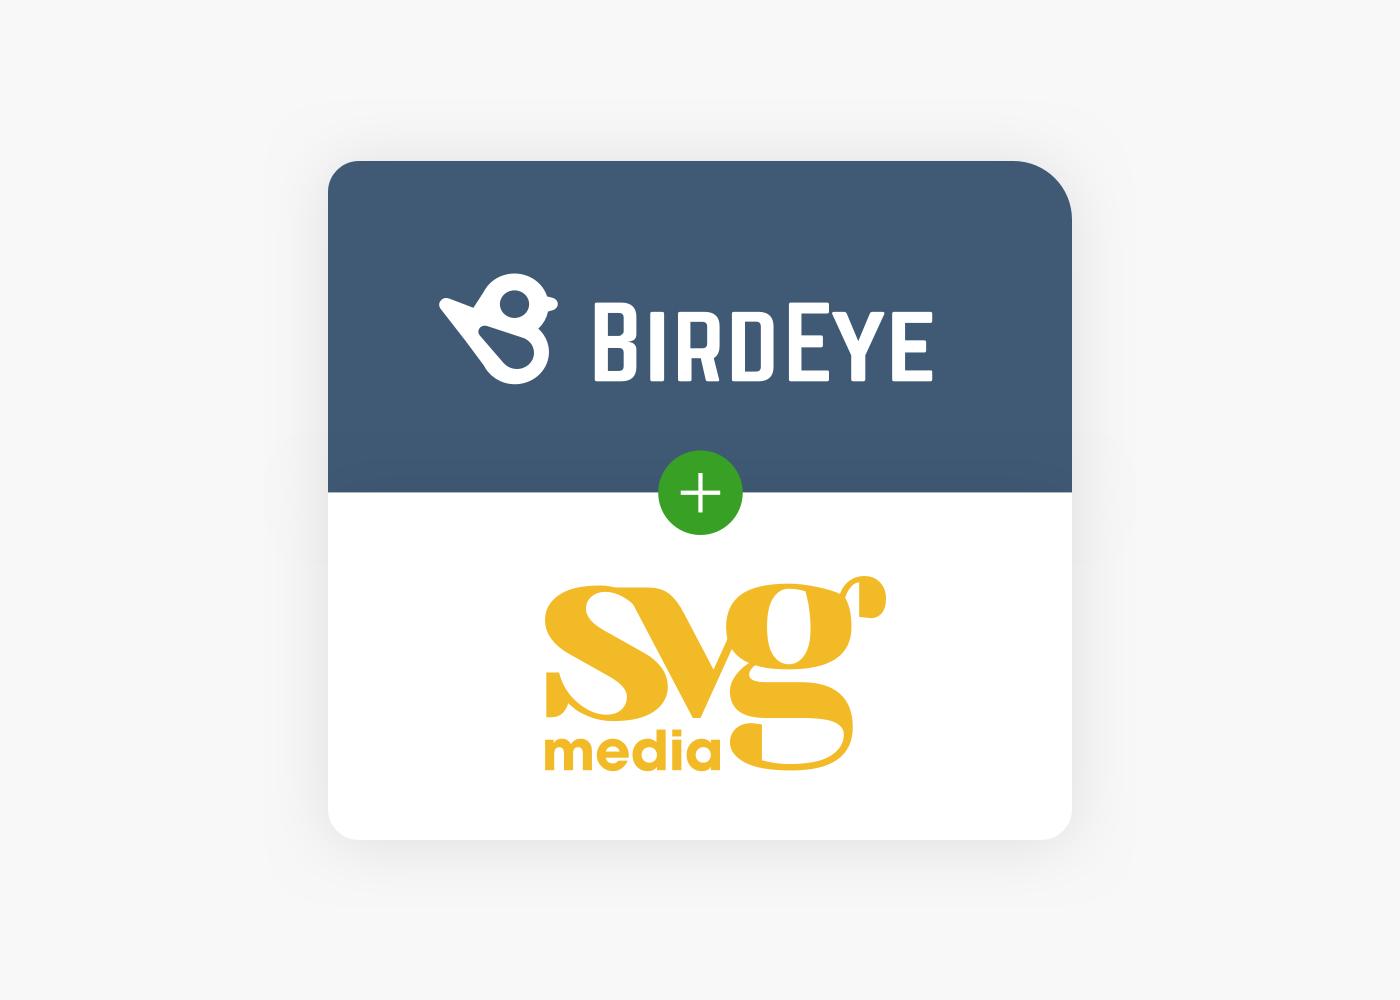 Birdeye Enters Strategic Partnership With Svg Media To Expand International Footprint 1550865452192